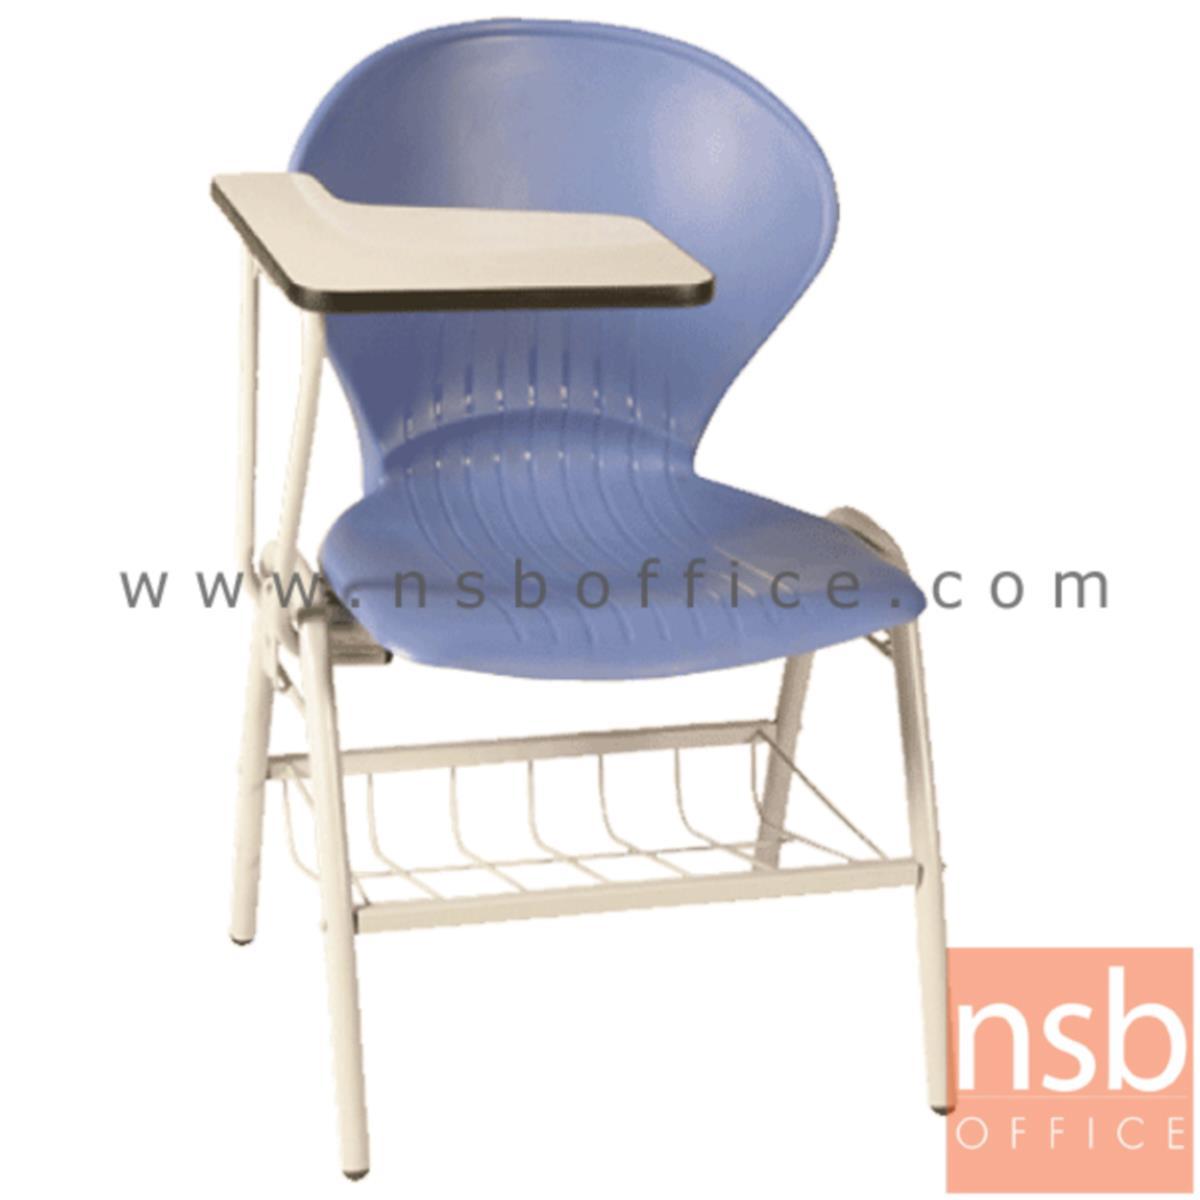 B07A055:เก้าอี้เลคเชอร์เฟรมโพลี่ รุ่น C076-466 (มีตะแกรงวางของ) ขาเหล็กพ่นสี